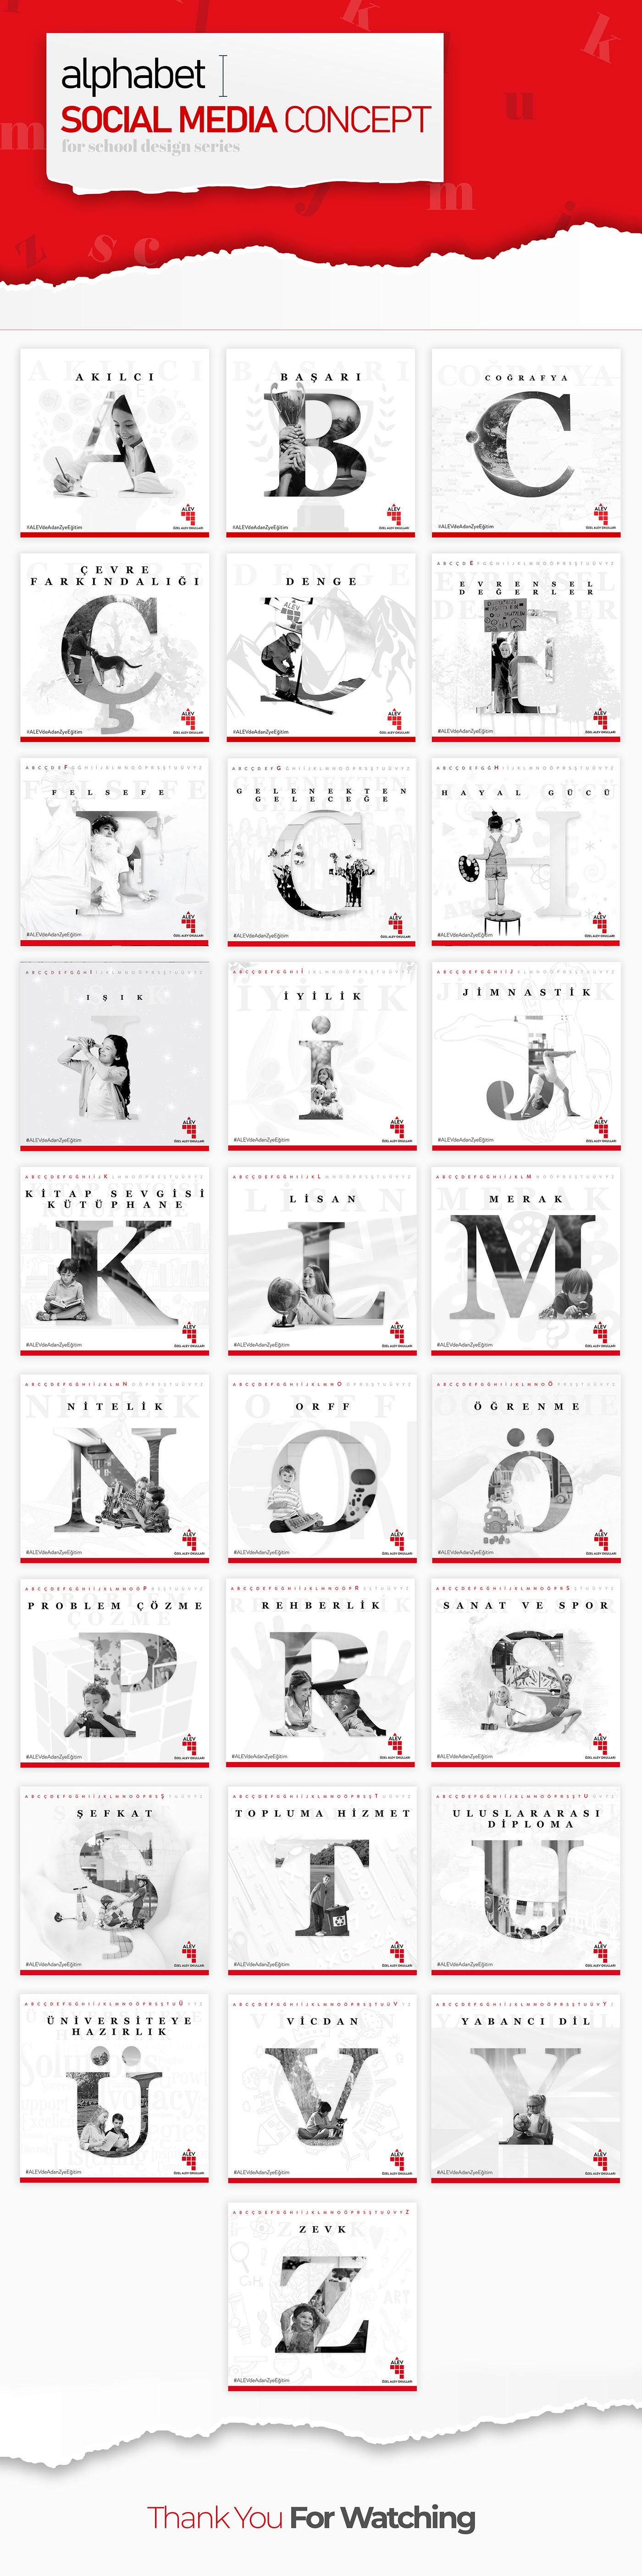 Alfabe alphabet concept Konsept social media social media alphabet social media concept Social Media Series sosyal medya